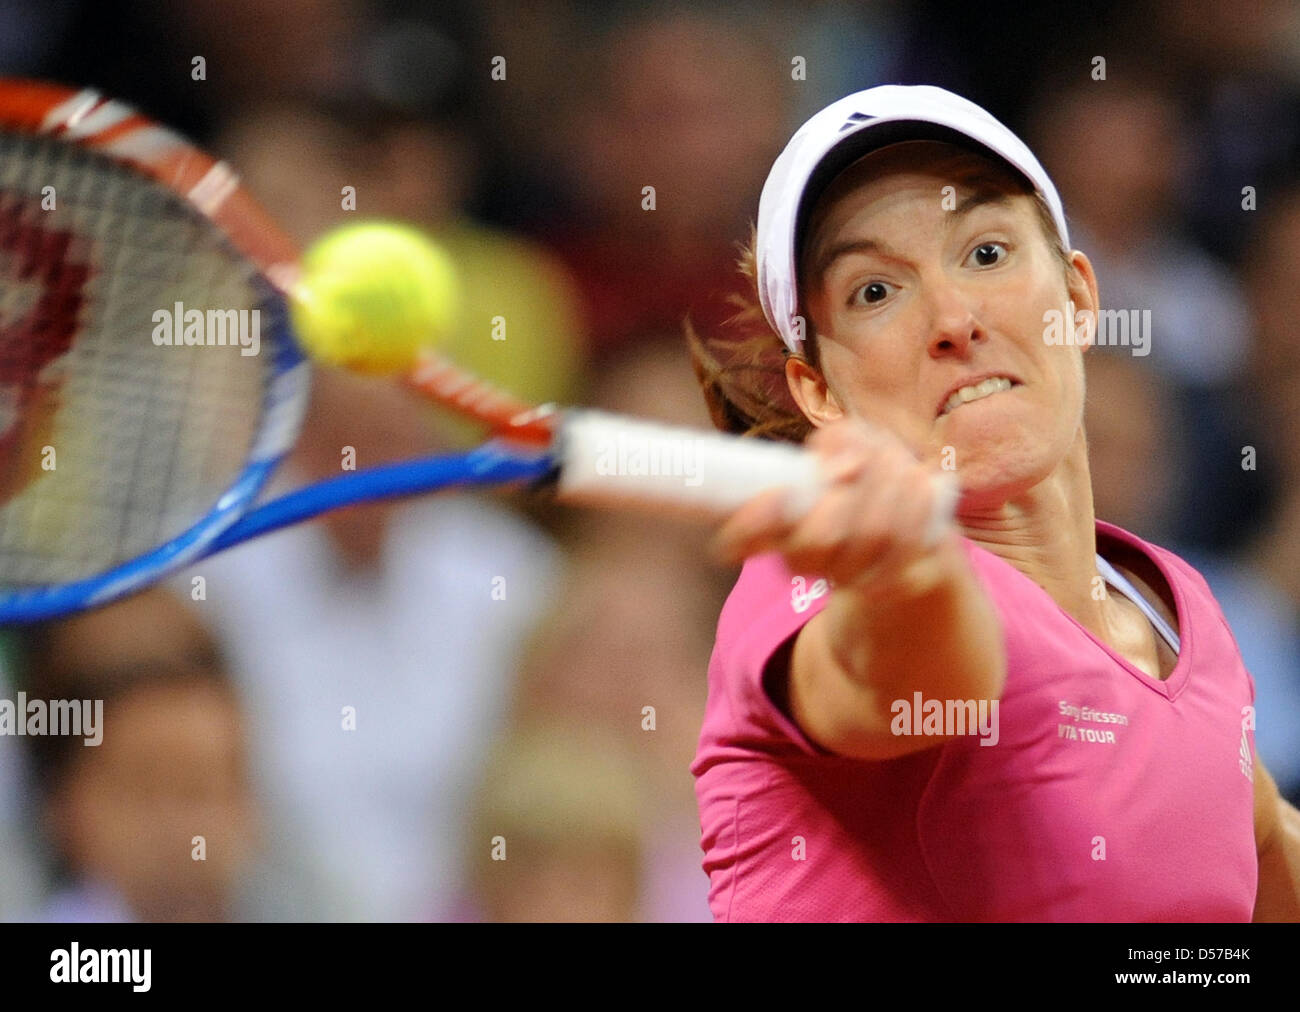 Belgium s Justine Henin plays against Australia s Samantha Stosur